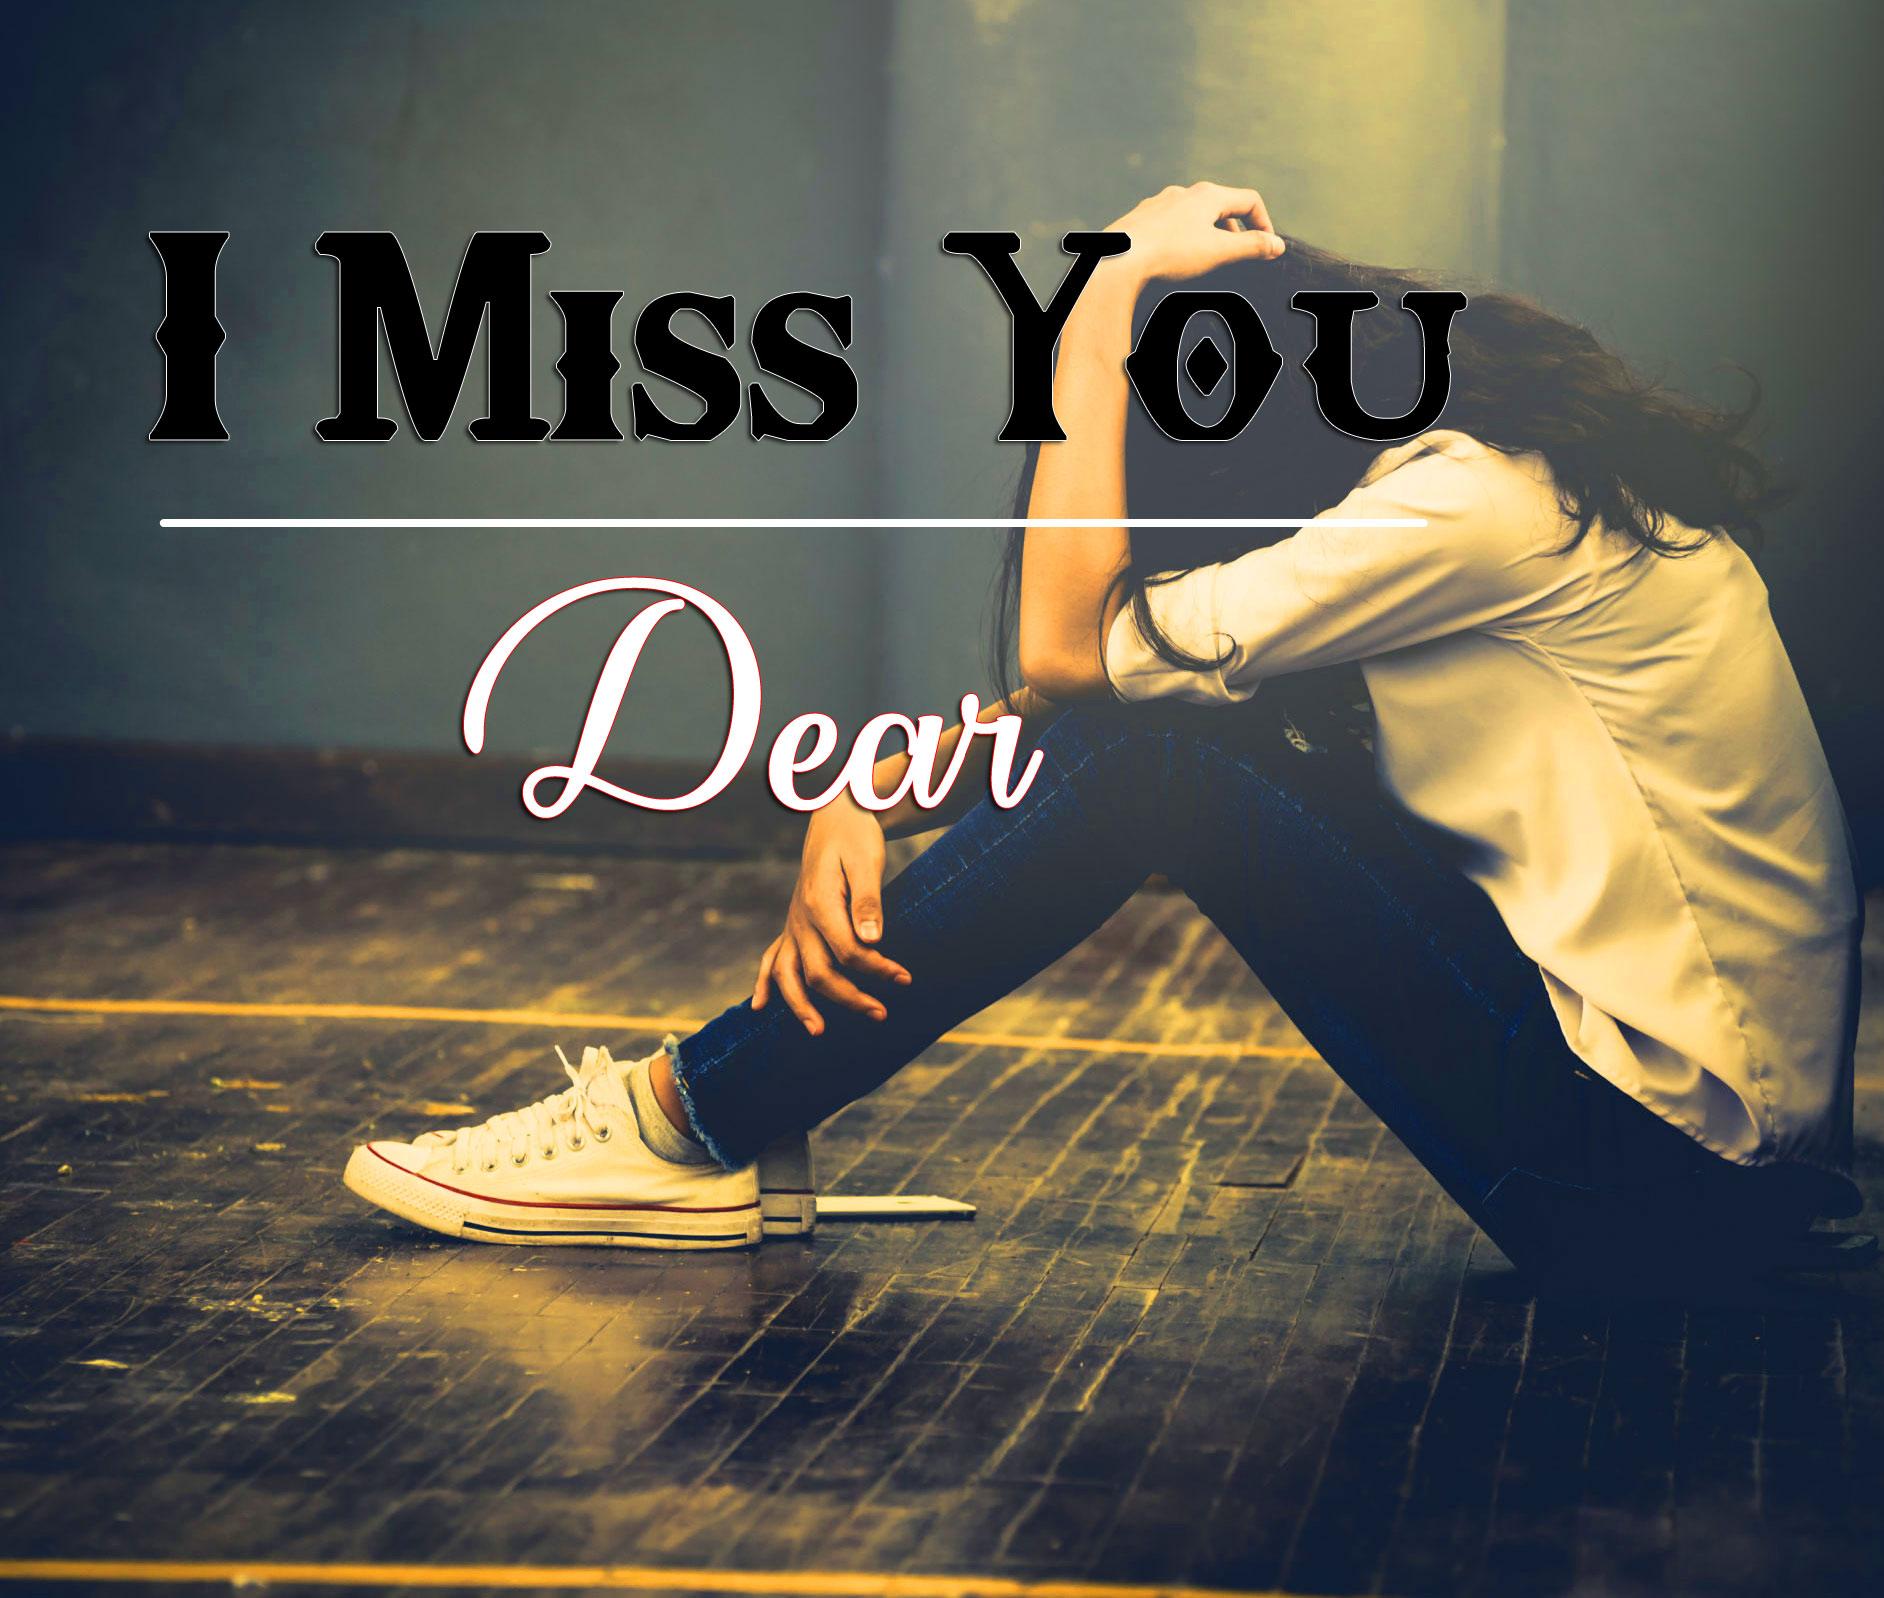 Girls Sad I miss you Images